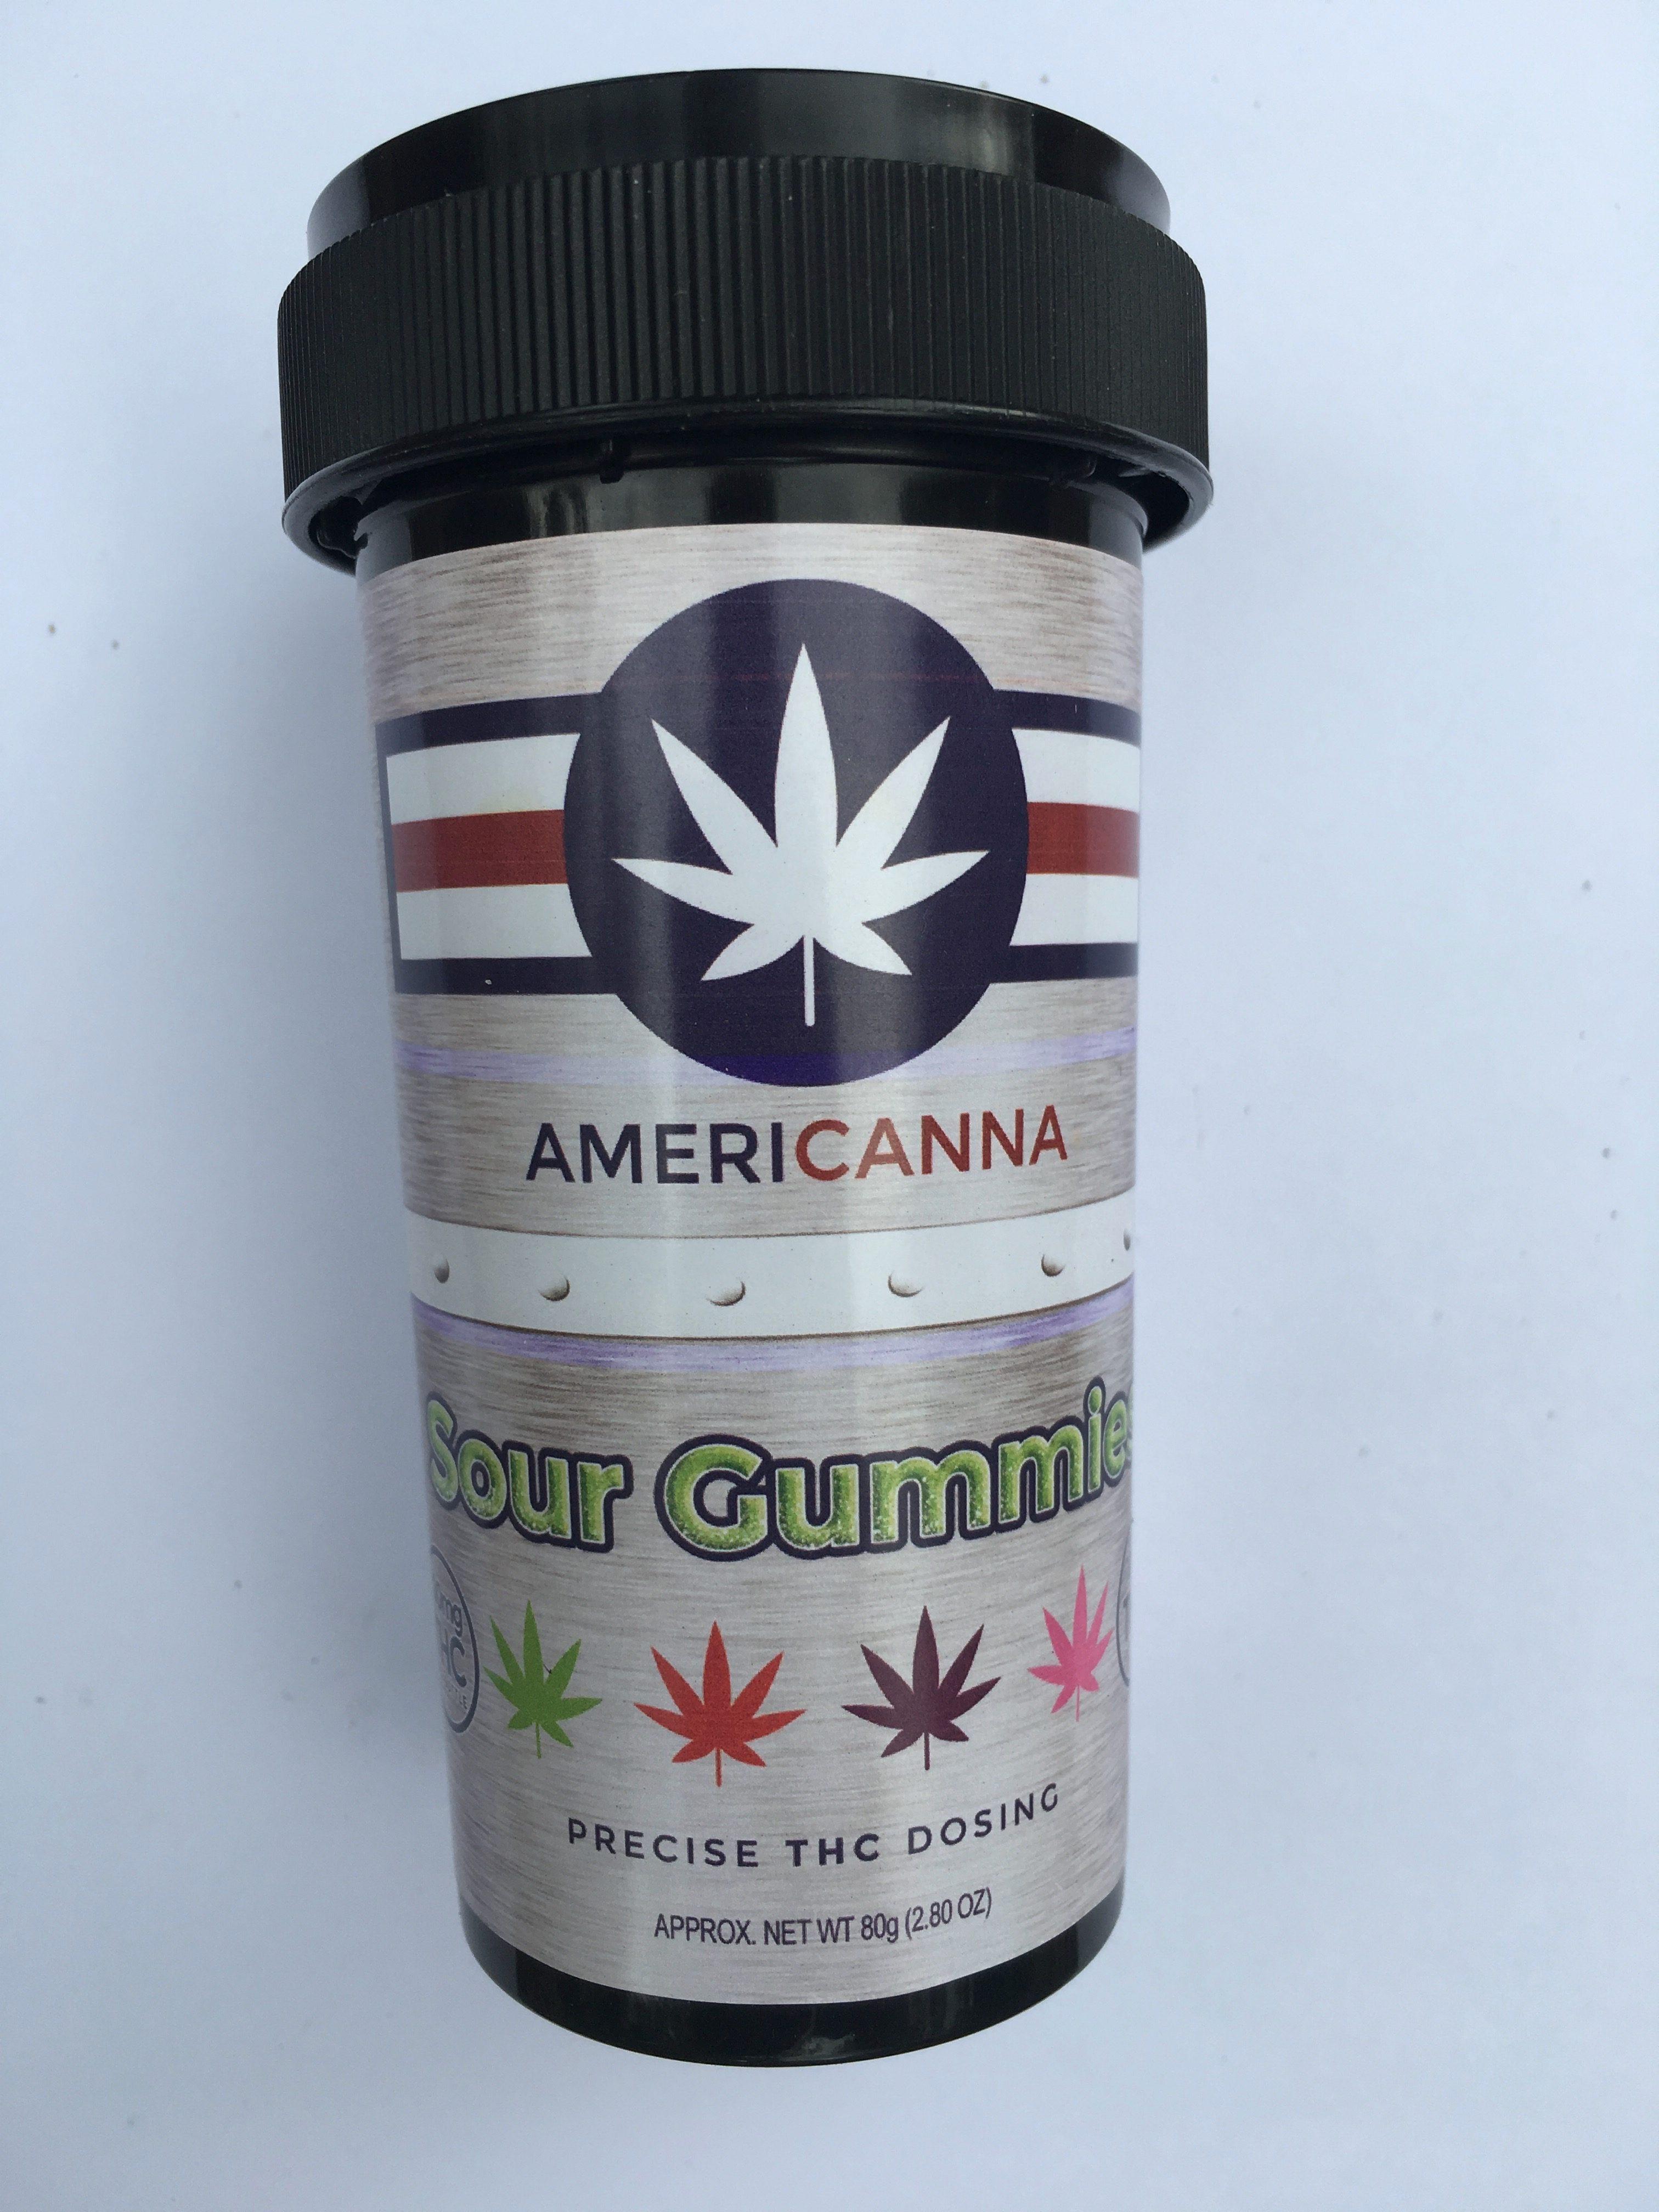 Americanna: Sour Gummies